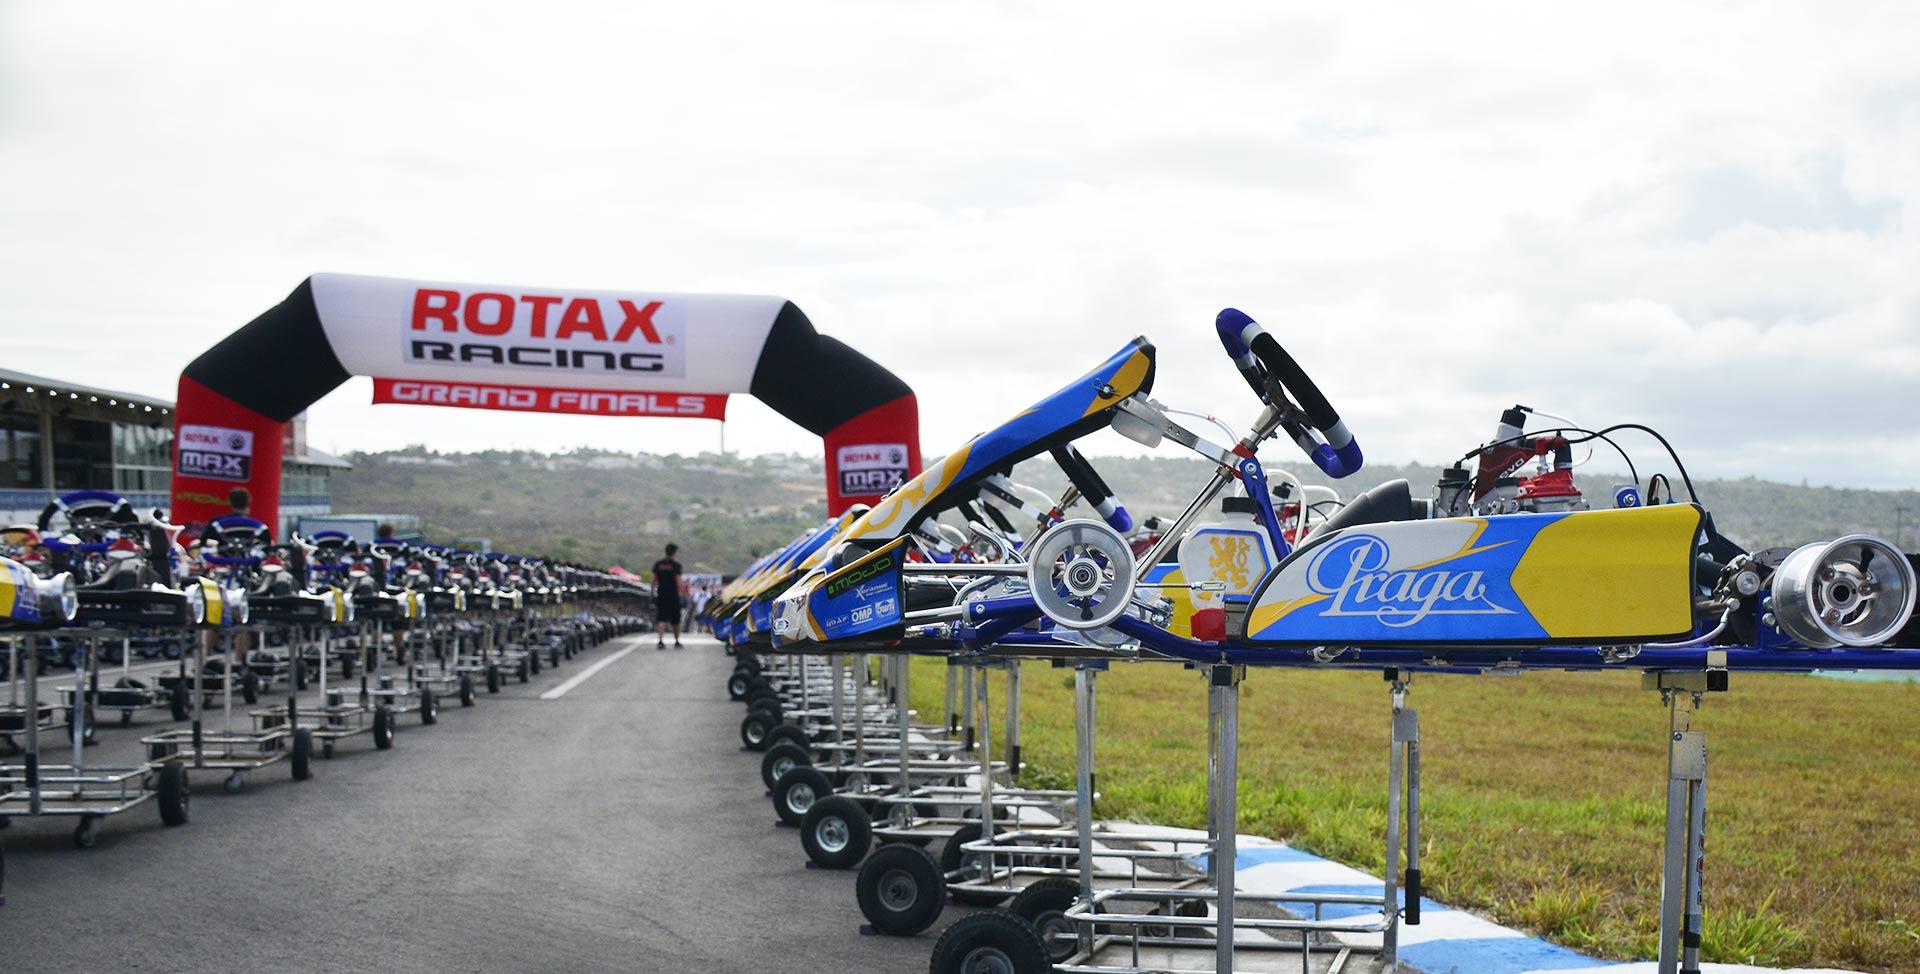 Praga Kart and Rotax. Together once again in Brazil